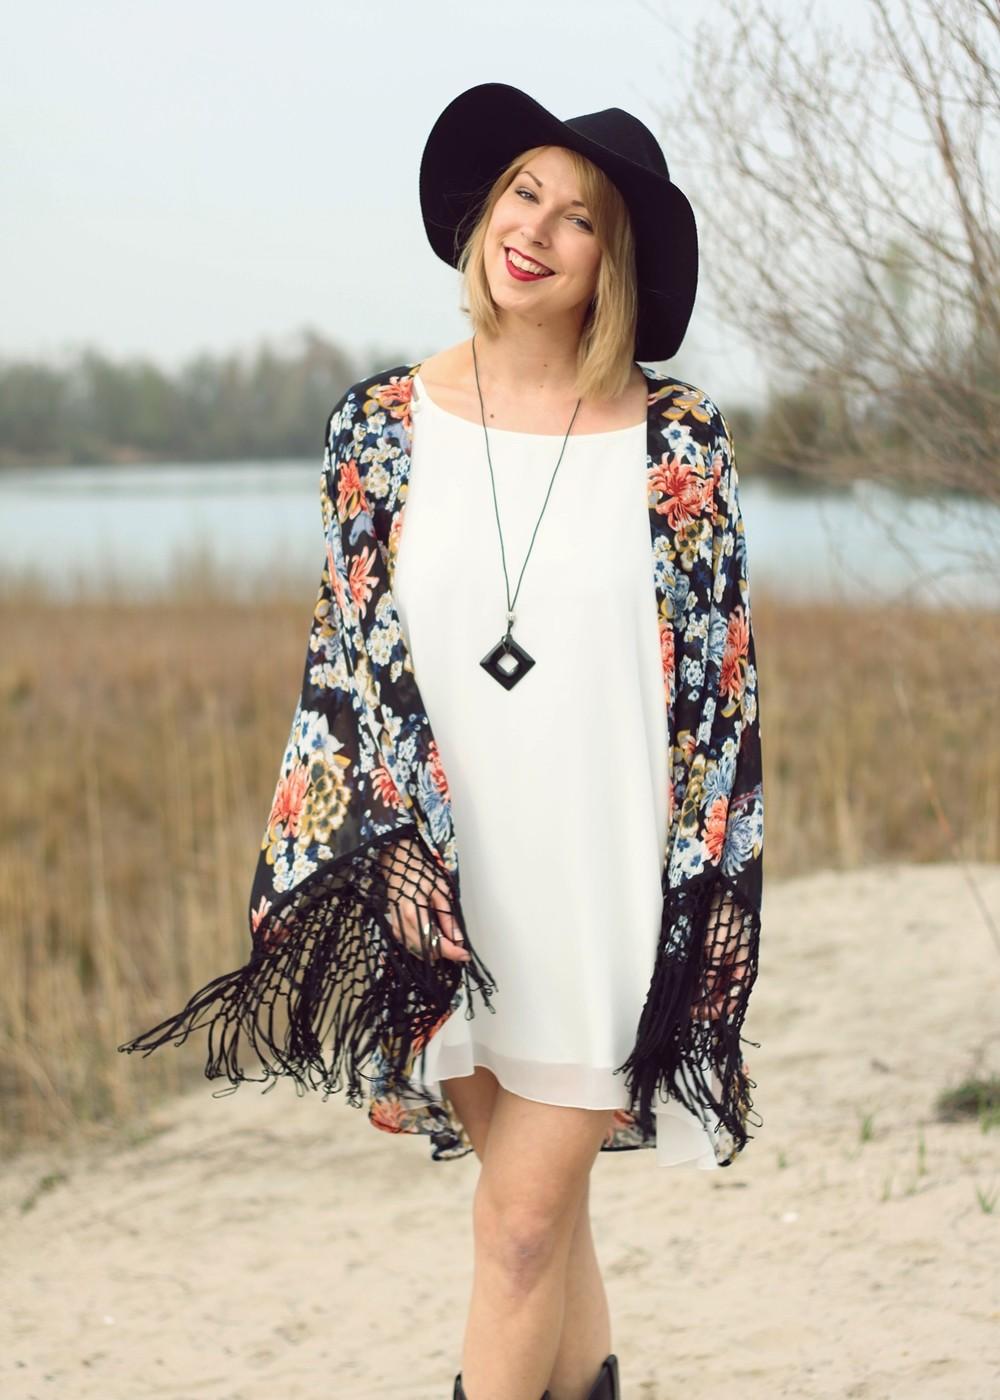 Fashionblogger Outfit Kimono weisses Kleid Cowboystiefel Schlapphut (10)